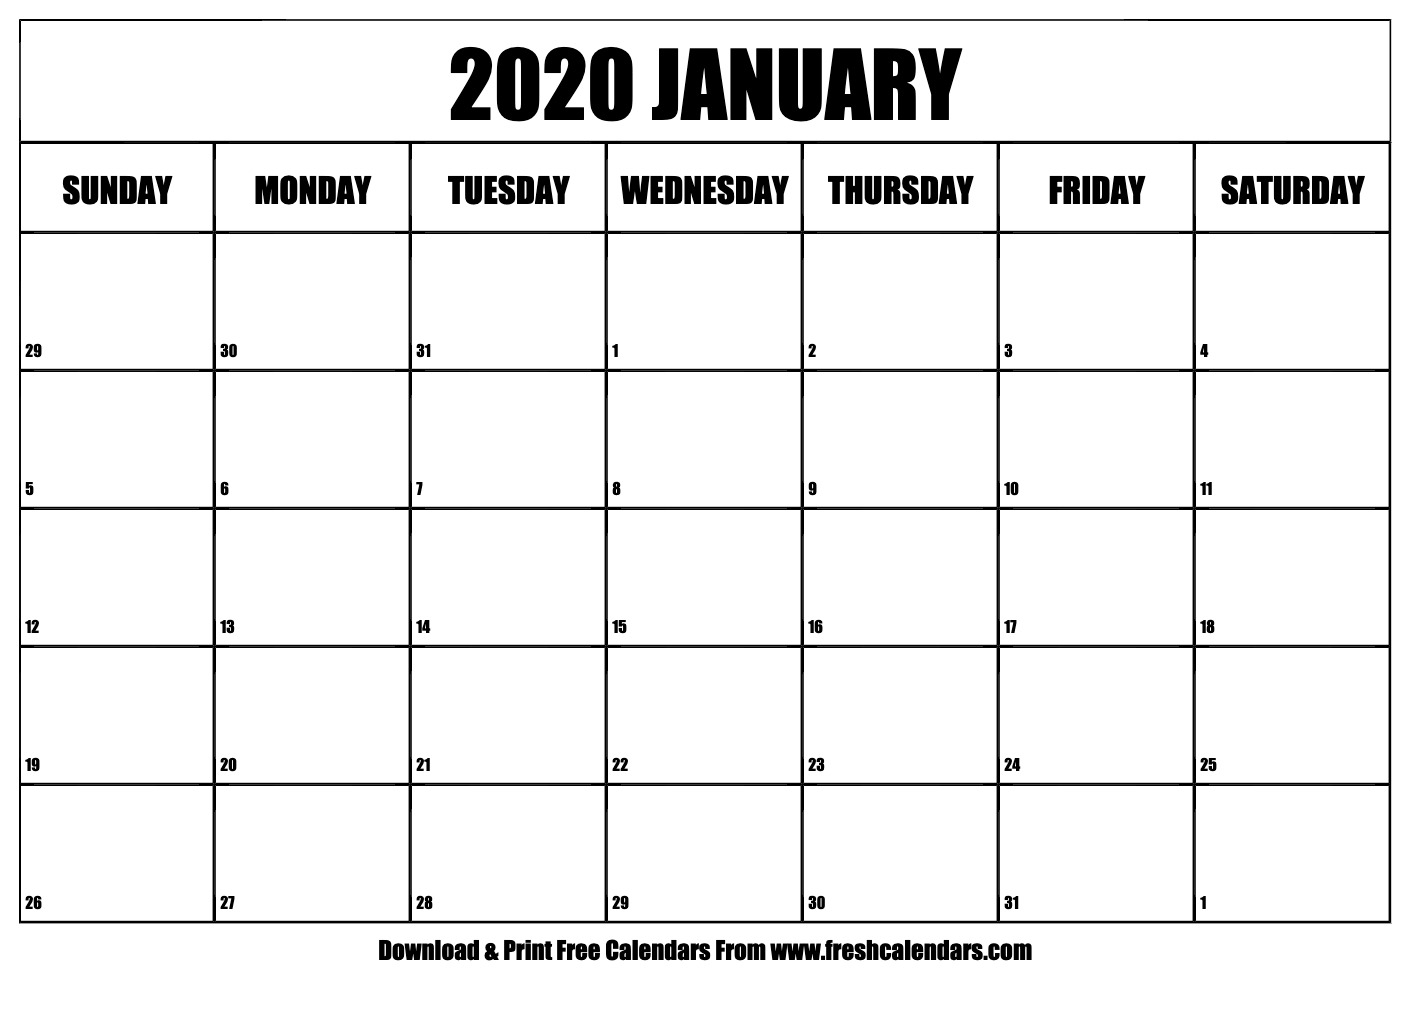 Print 2020 Calendar 11X17 | Calendar Printables Free Templates